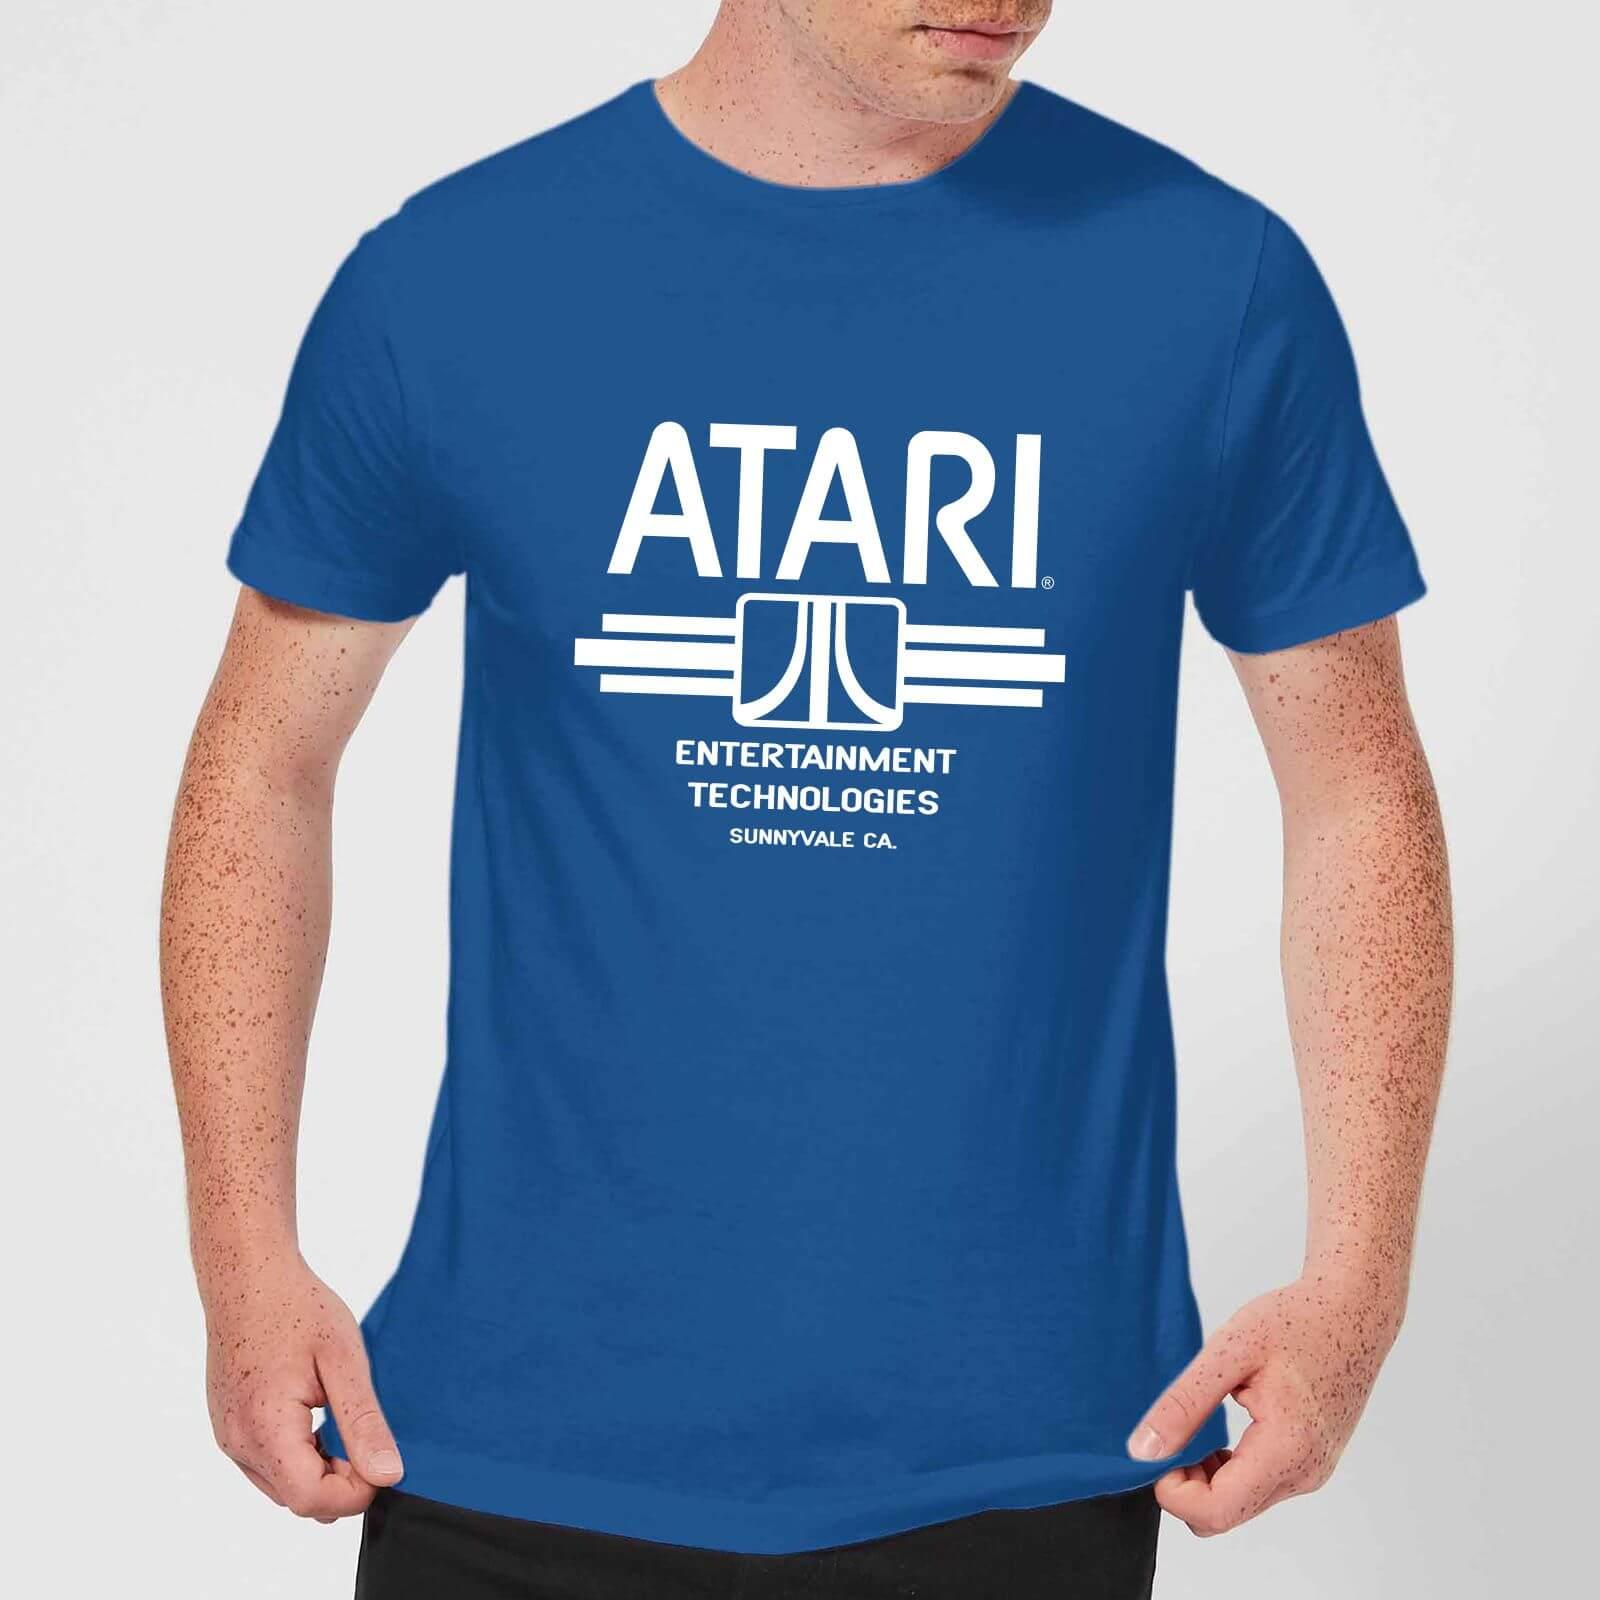 Atari Ent Tech Men's T-Shirt - Royal Blue - XXL - Royal Blue